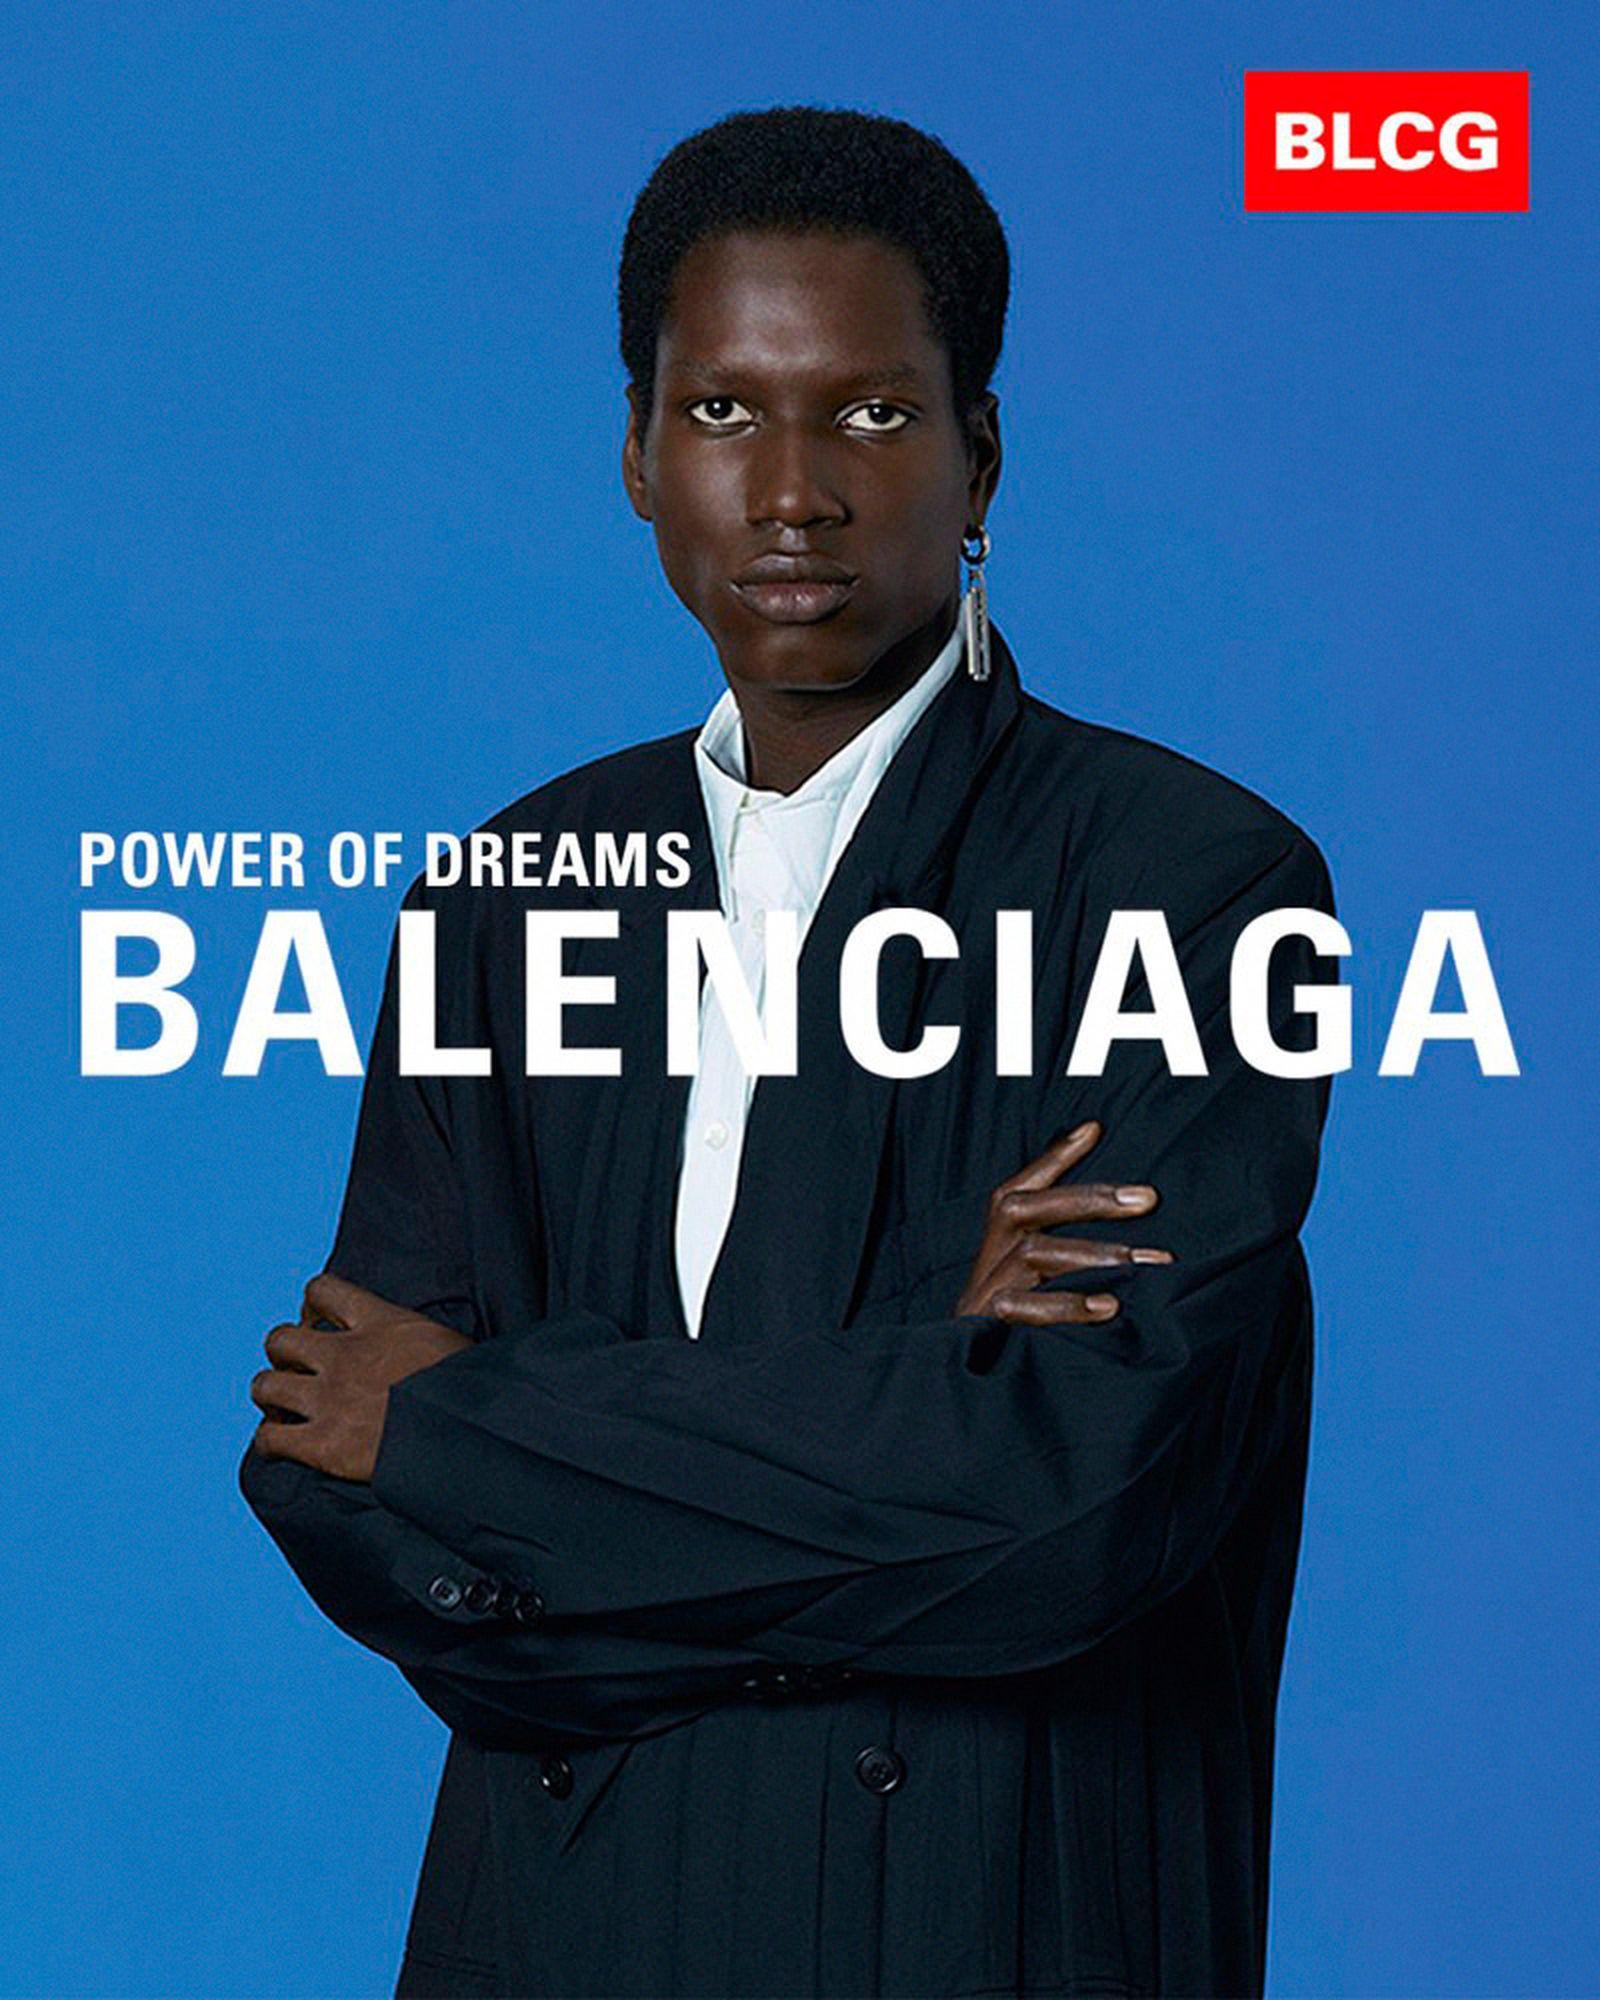 balenciagas-ss20-collection-genius-political-statement03